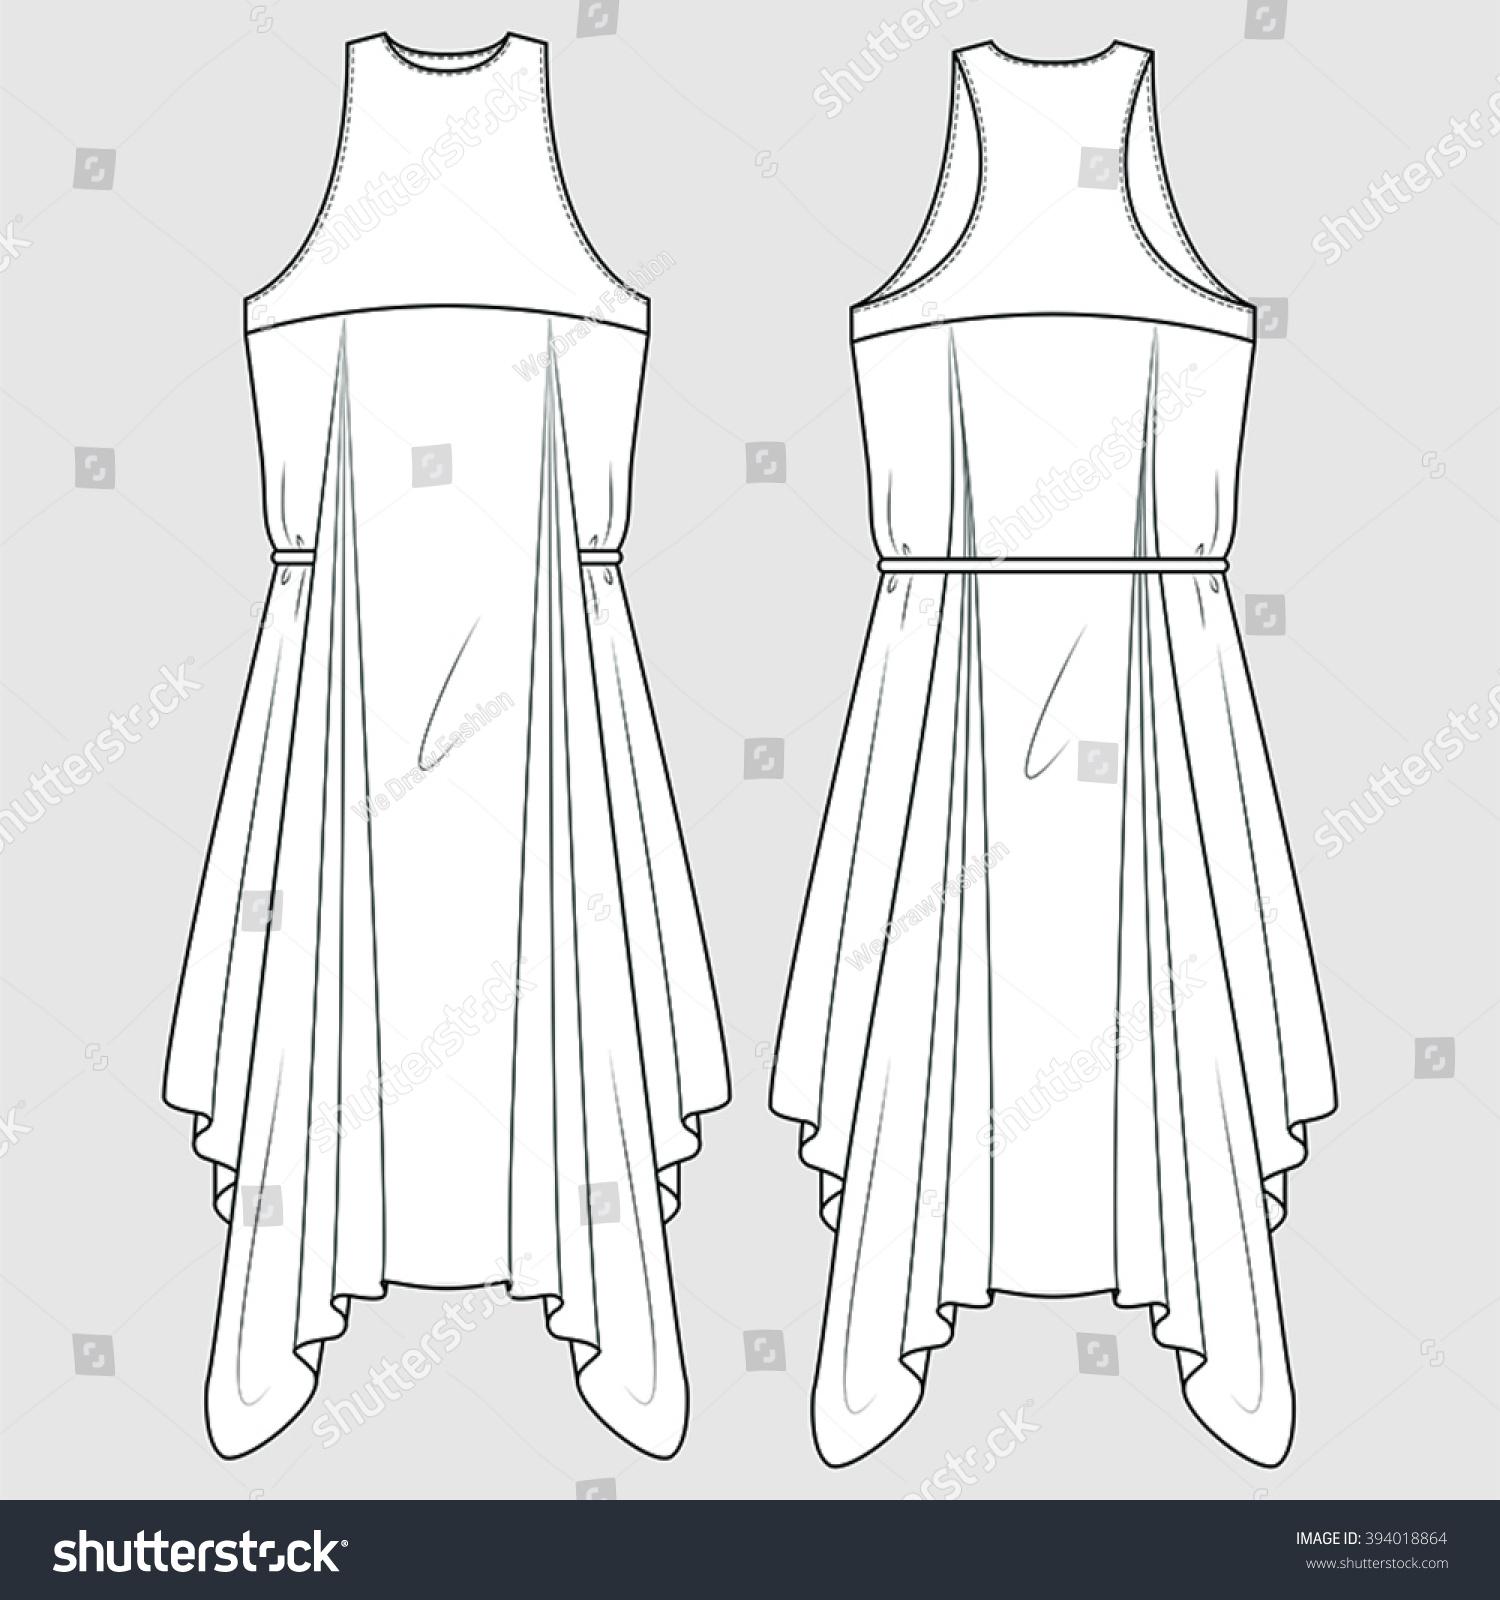 Racer Back Draped Formal Dress Fashion Stock Vector Royalty Free 394018864